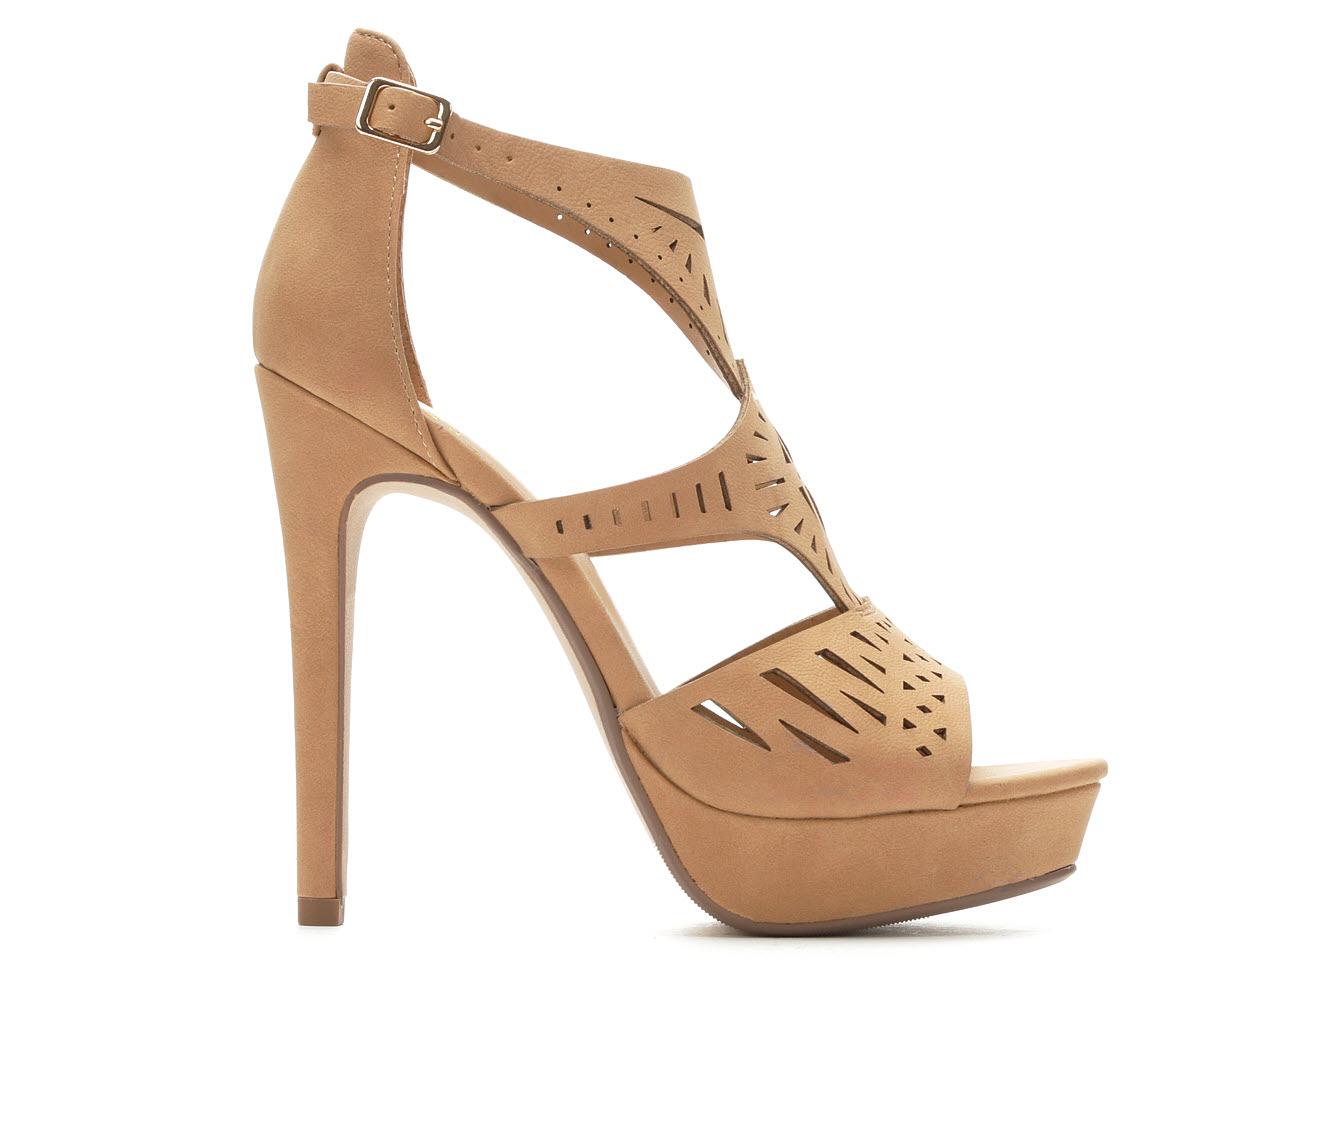 Delicious Abagale Women's Dress Shoe (Brown Faux Leather)